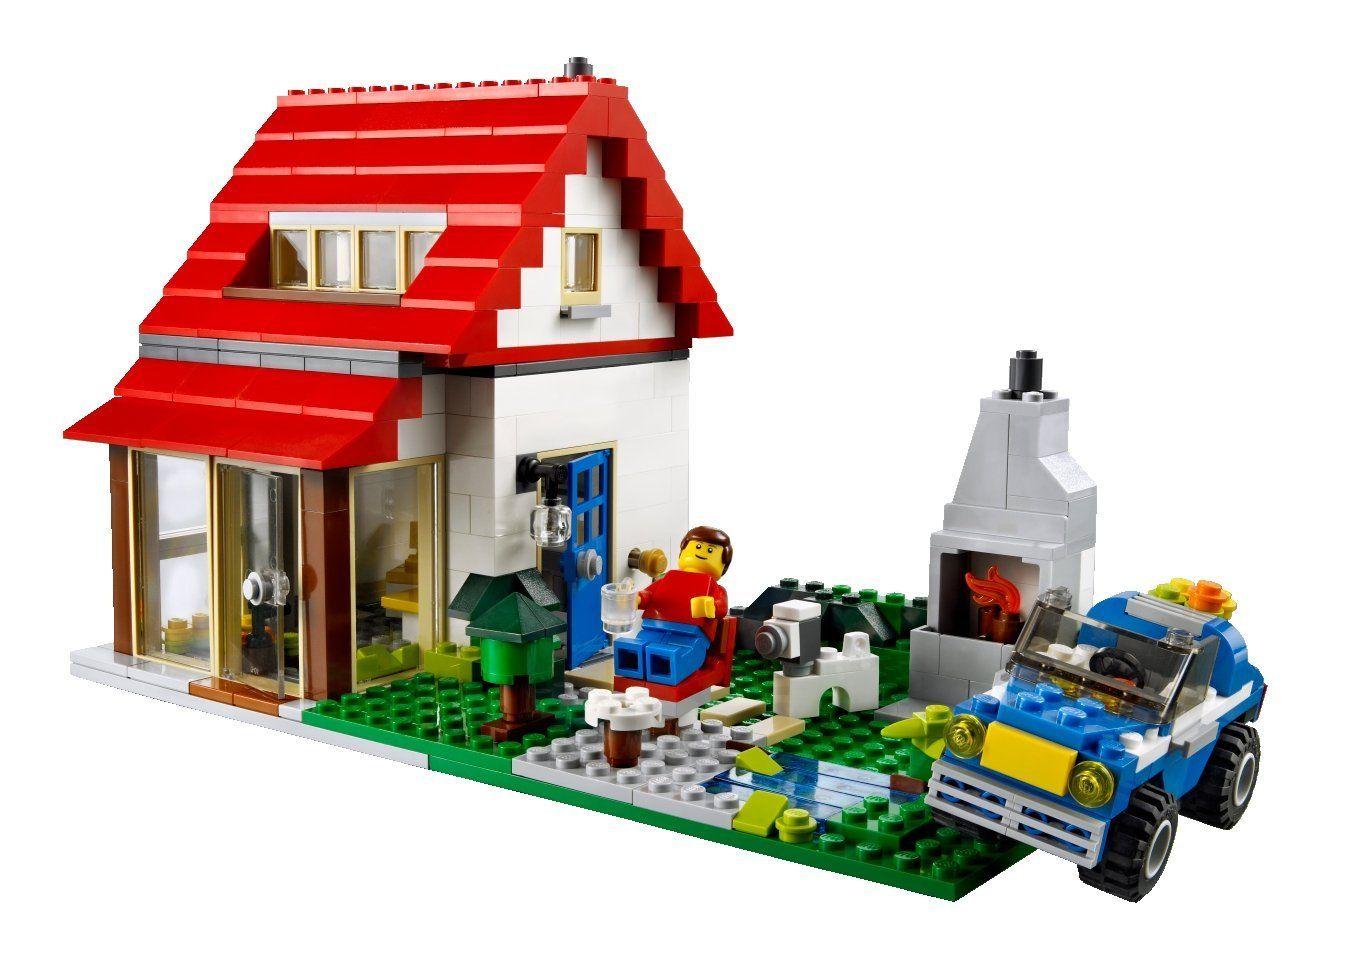 amazon com lego creator 5771 hillside house toys u0026 games i like